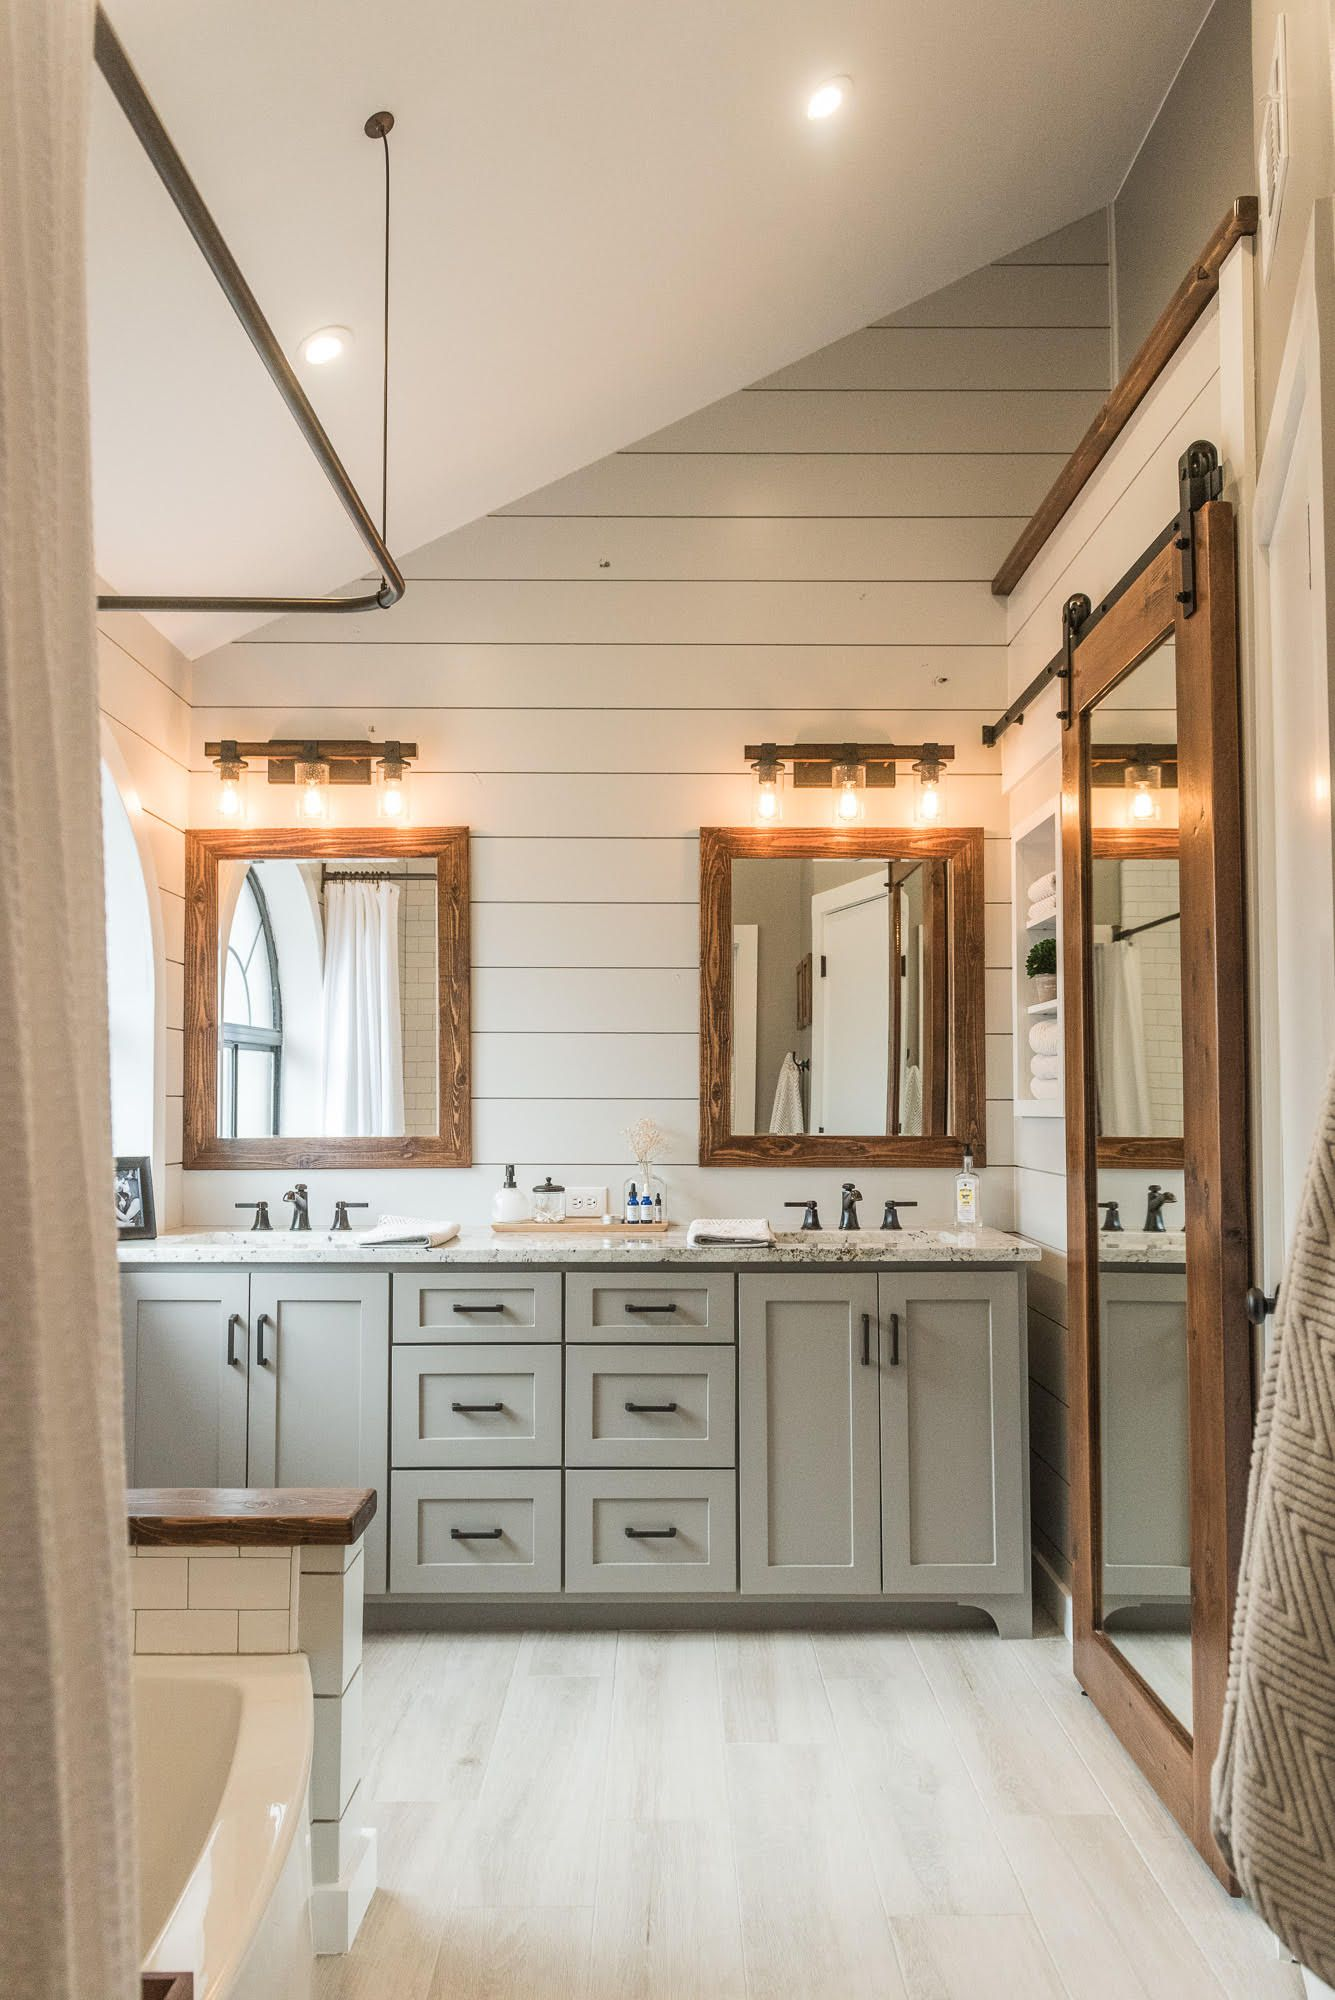 Barn door with mirror for closet home sweet home pinterest kúpeľňa